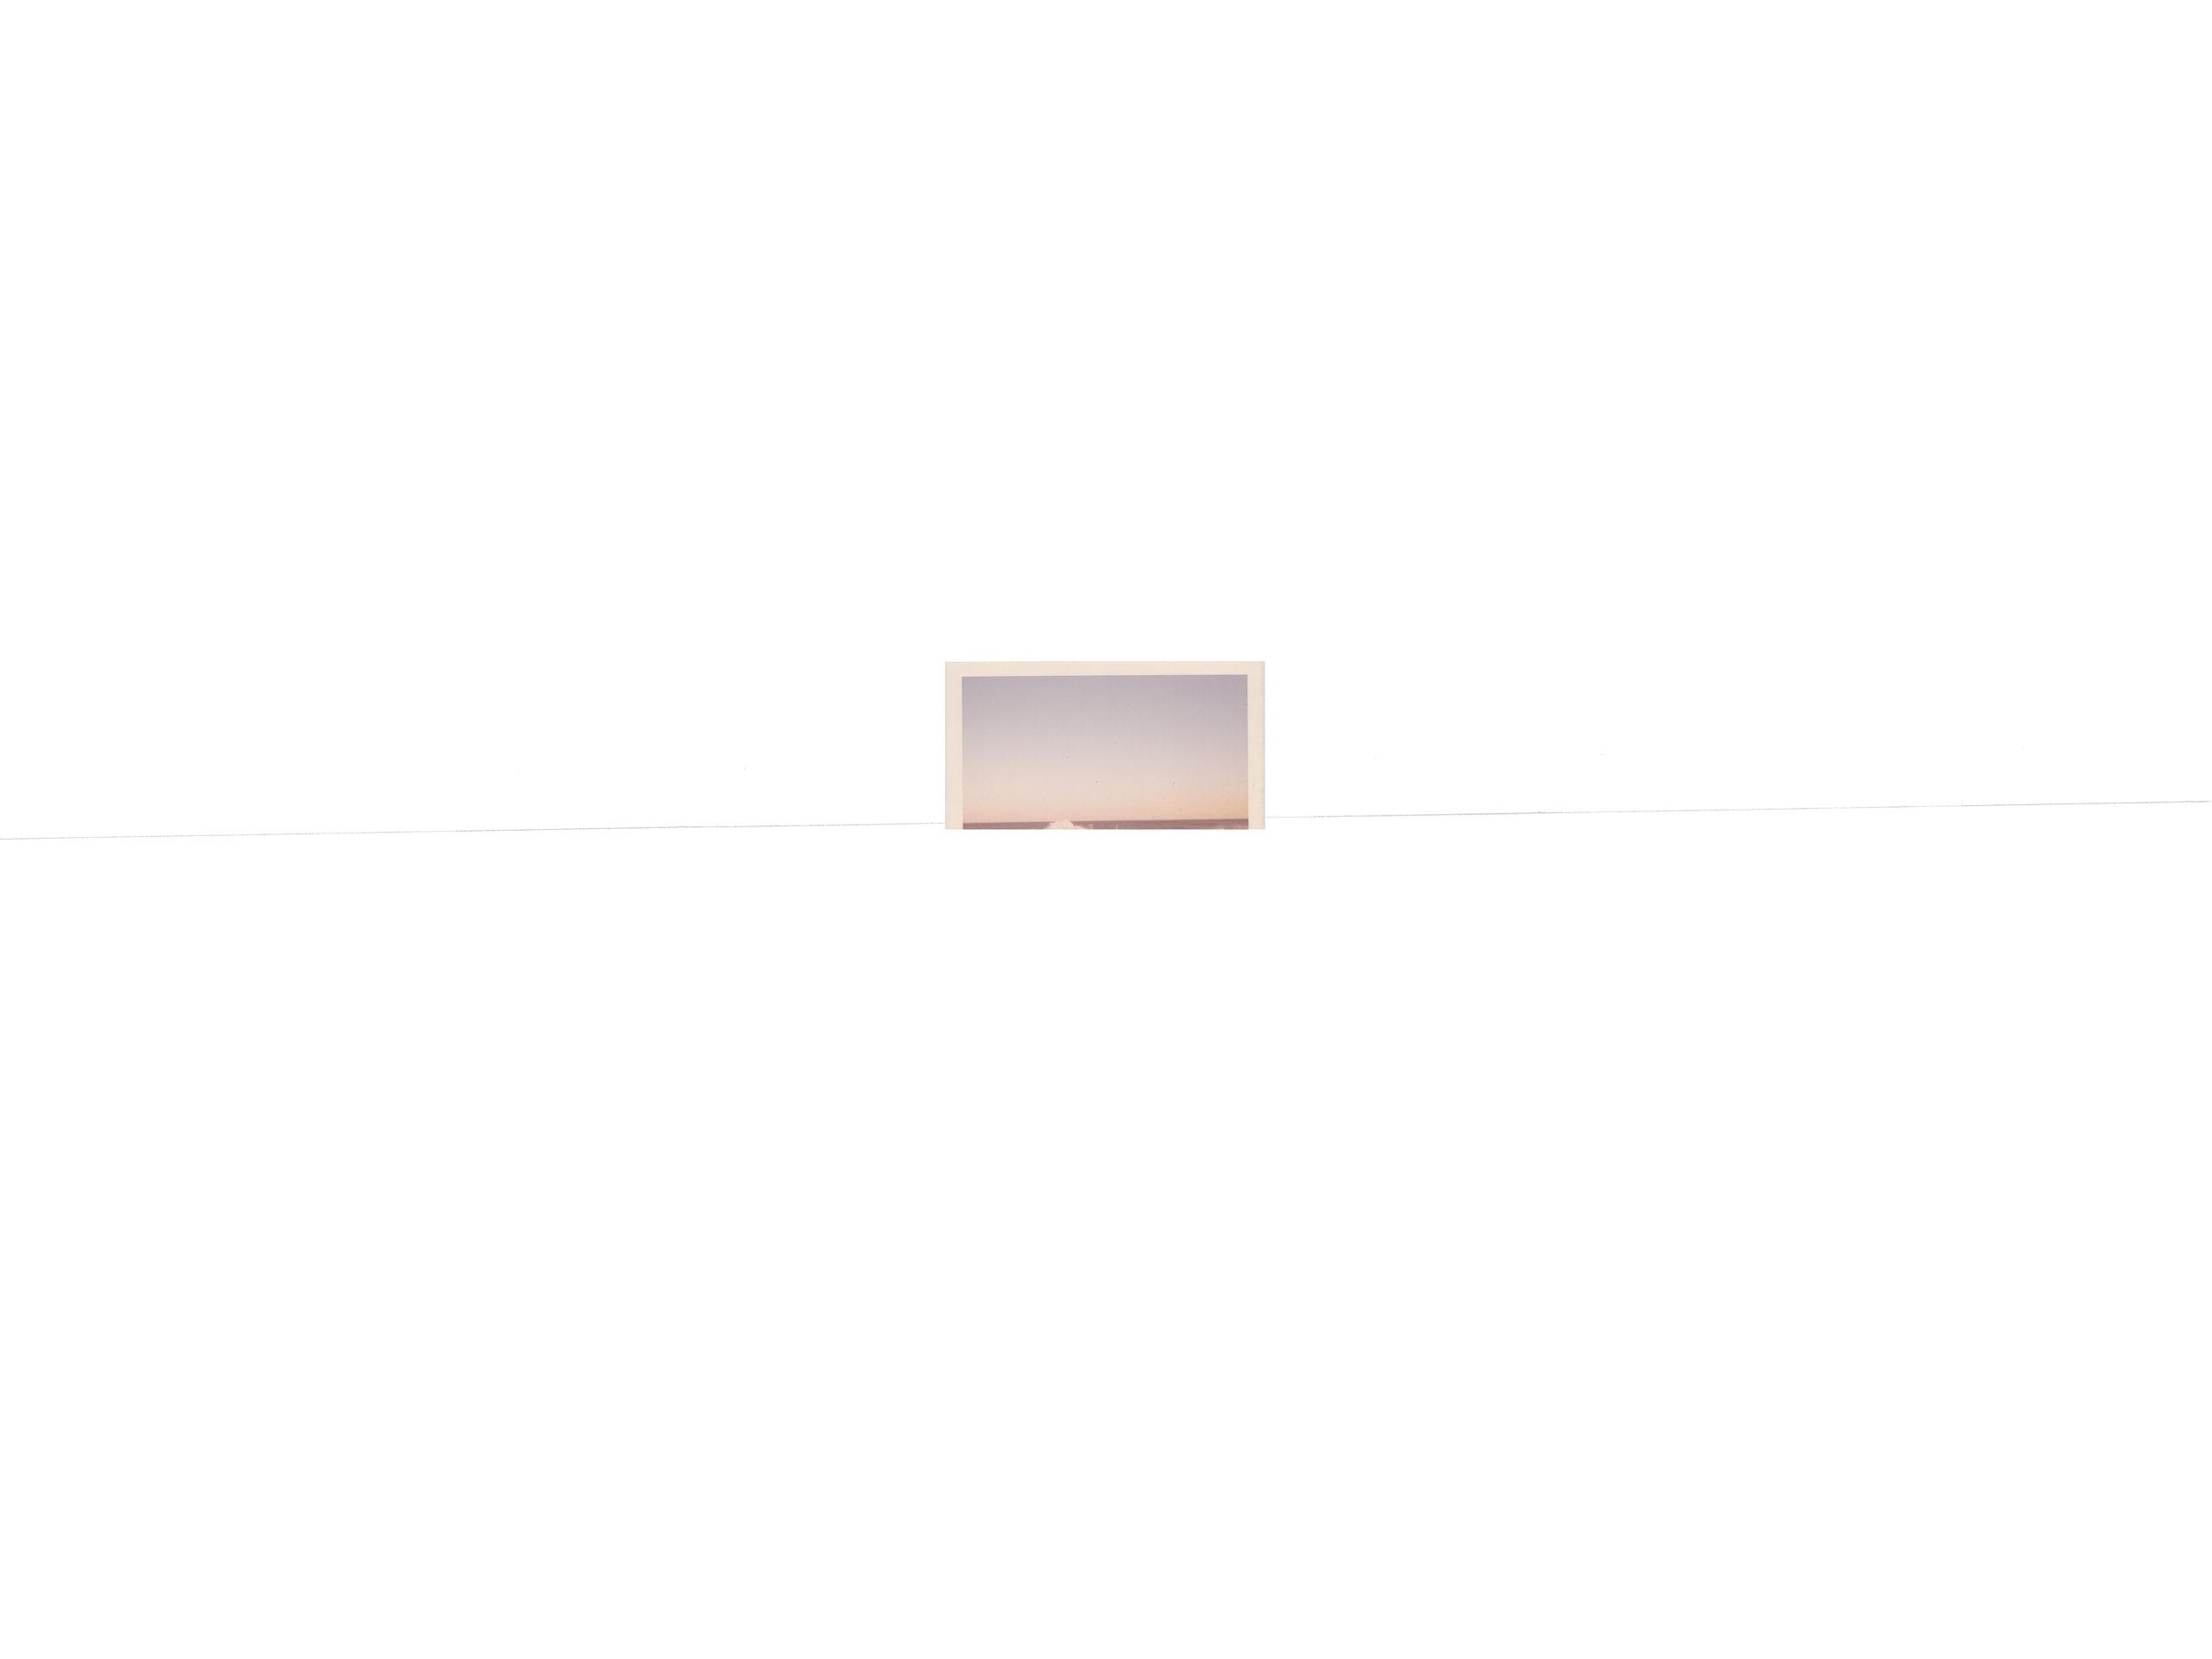 Westward Yearning No. 6  18 x 24 inches | 2018